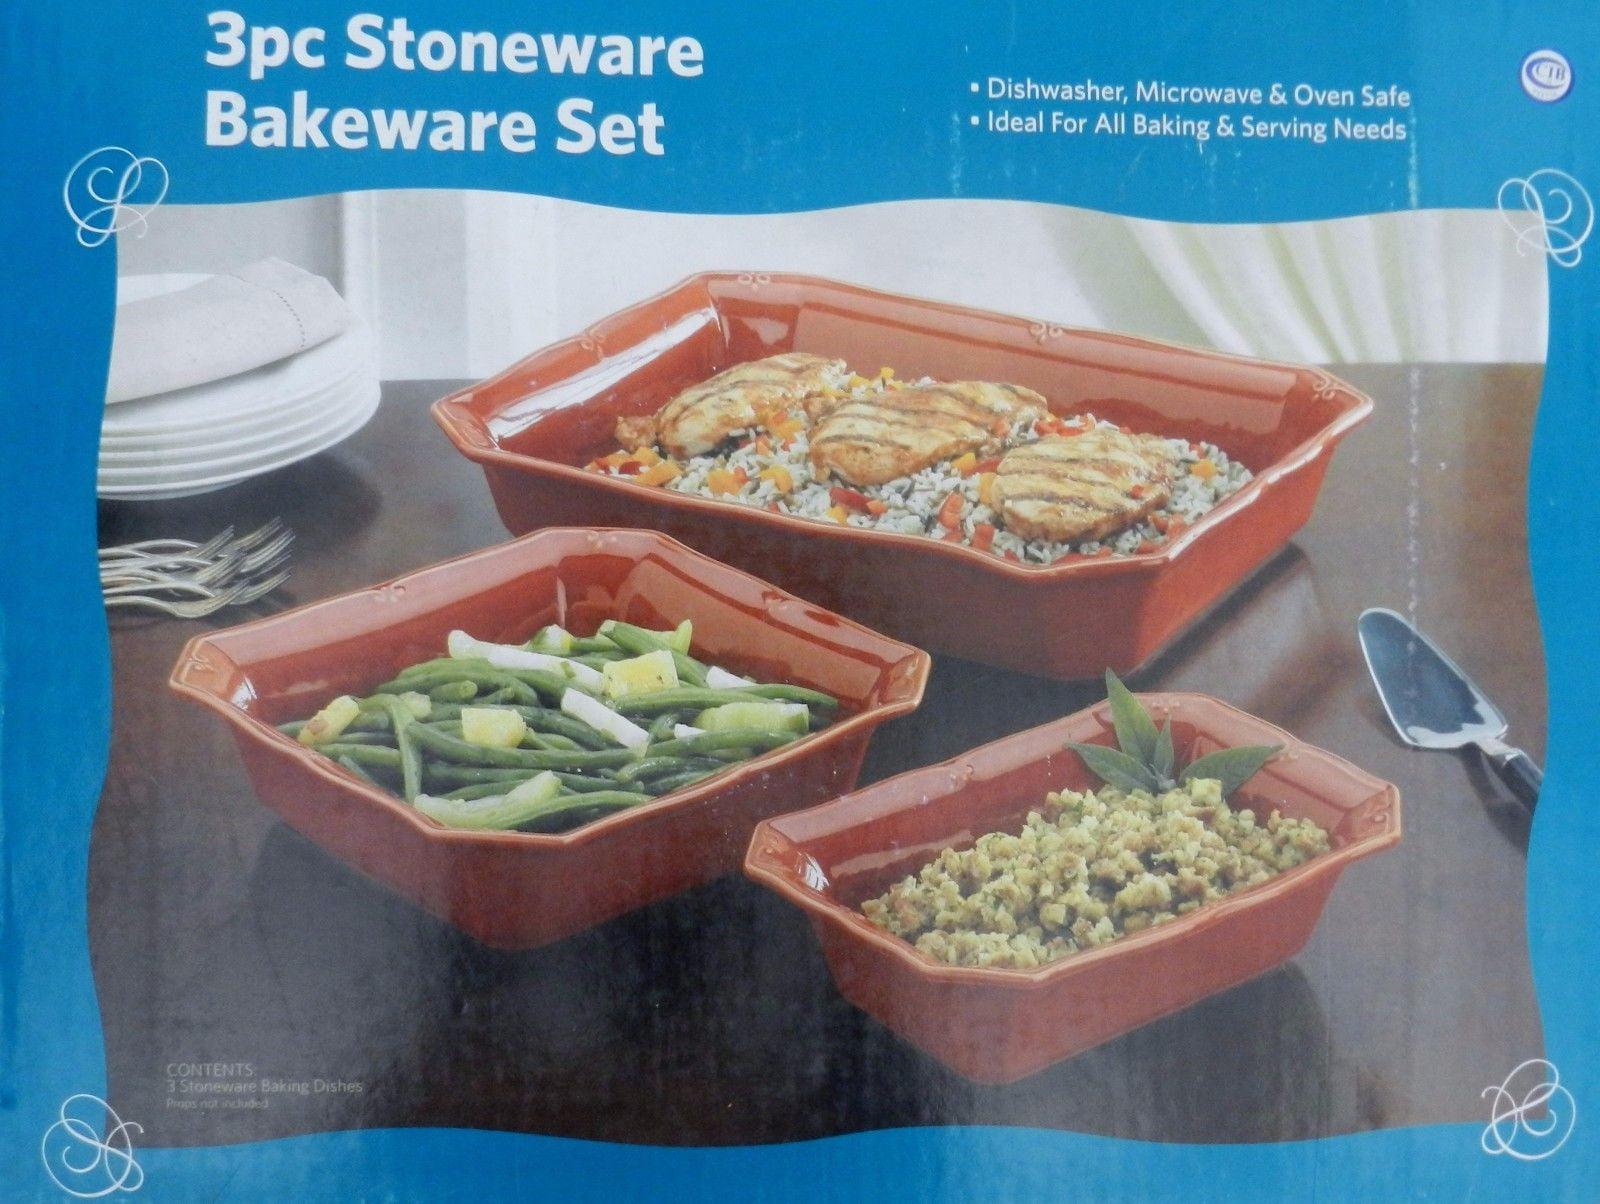 3 Piece Brick Dishwasher And Oven Safe StoNeware Bakeware Set by